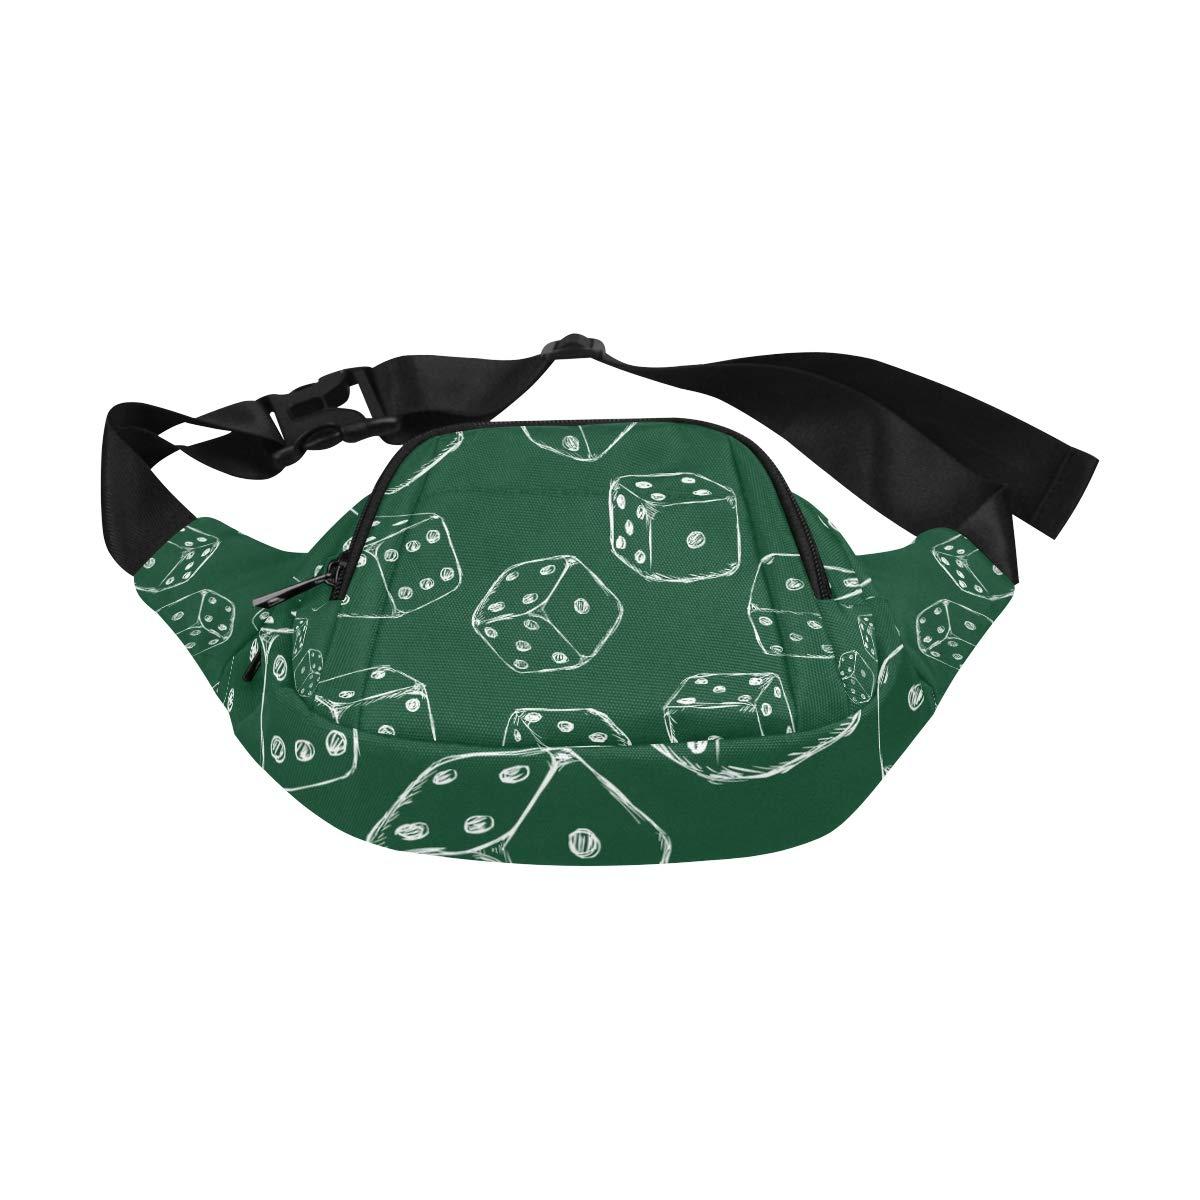 Top View Of White Dice Fenny Packs Waist Bags Adjustable Belt Waterproof Nylon Travel Running Sport Vacation Party For Men Women Boys Girls Kids